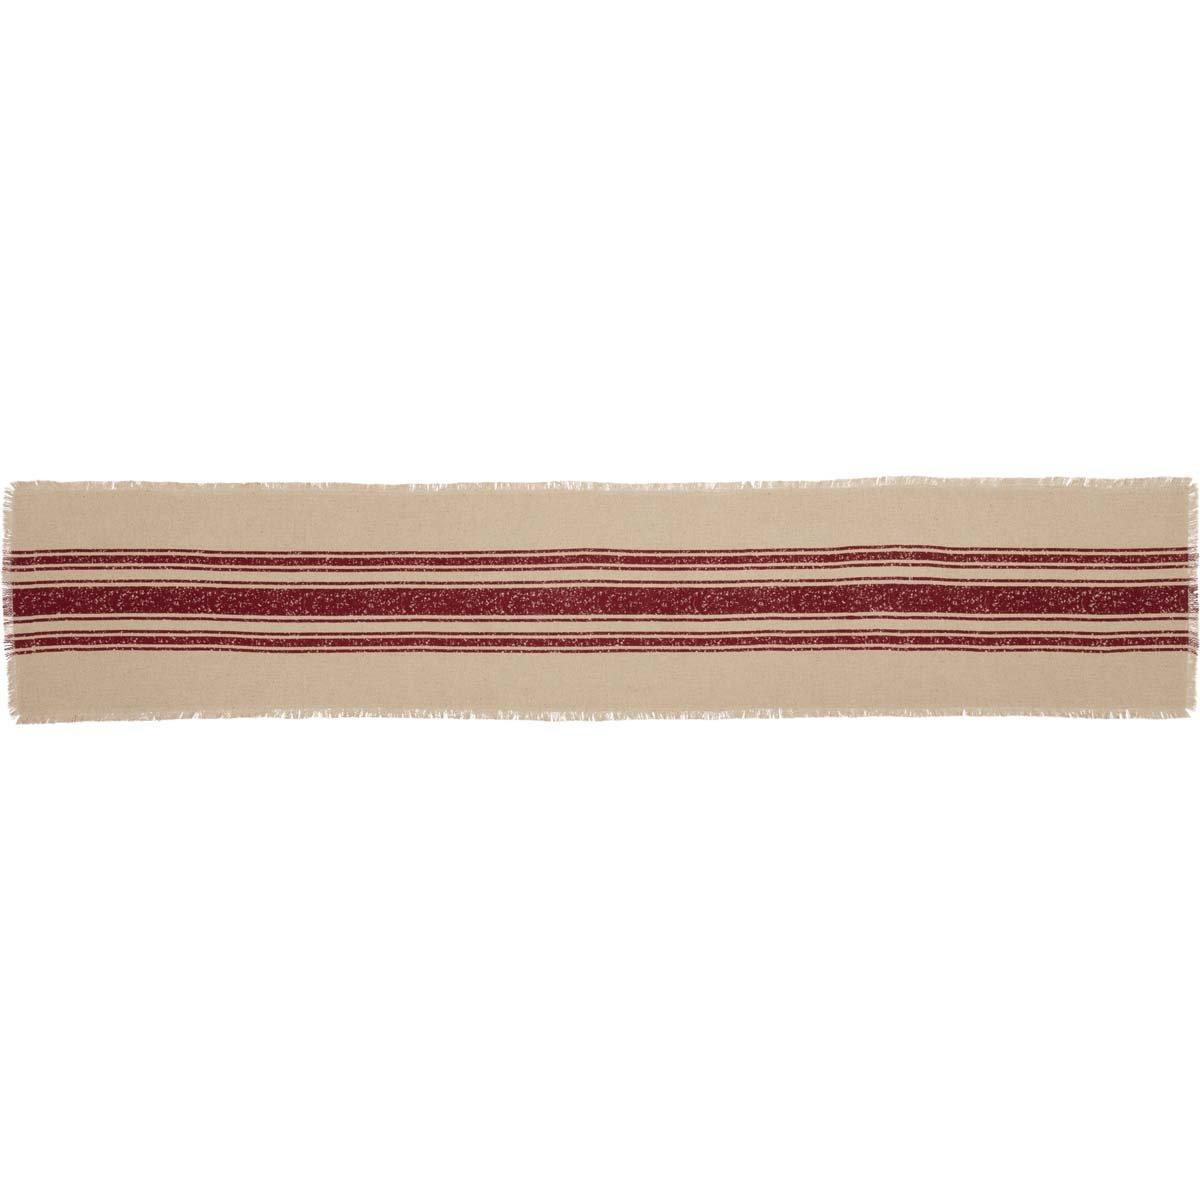 "VHC Brands Farmhouse Holiday Tabletop & Kitchen-Vintage Burlap Stripe White Runner, 13"" x 72"", Red"